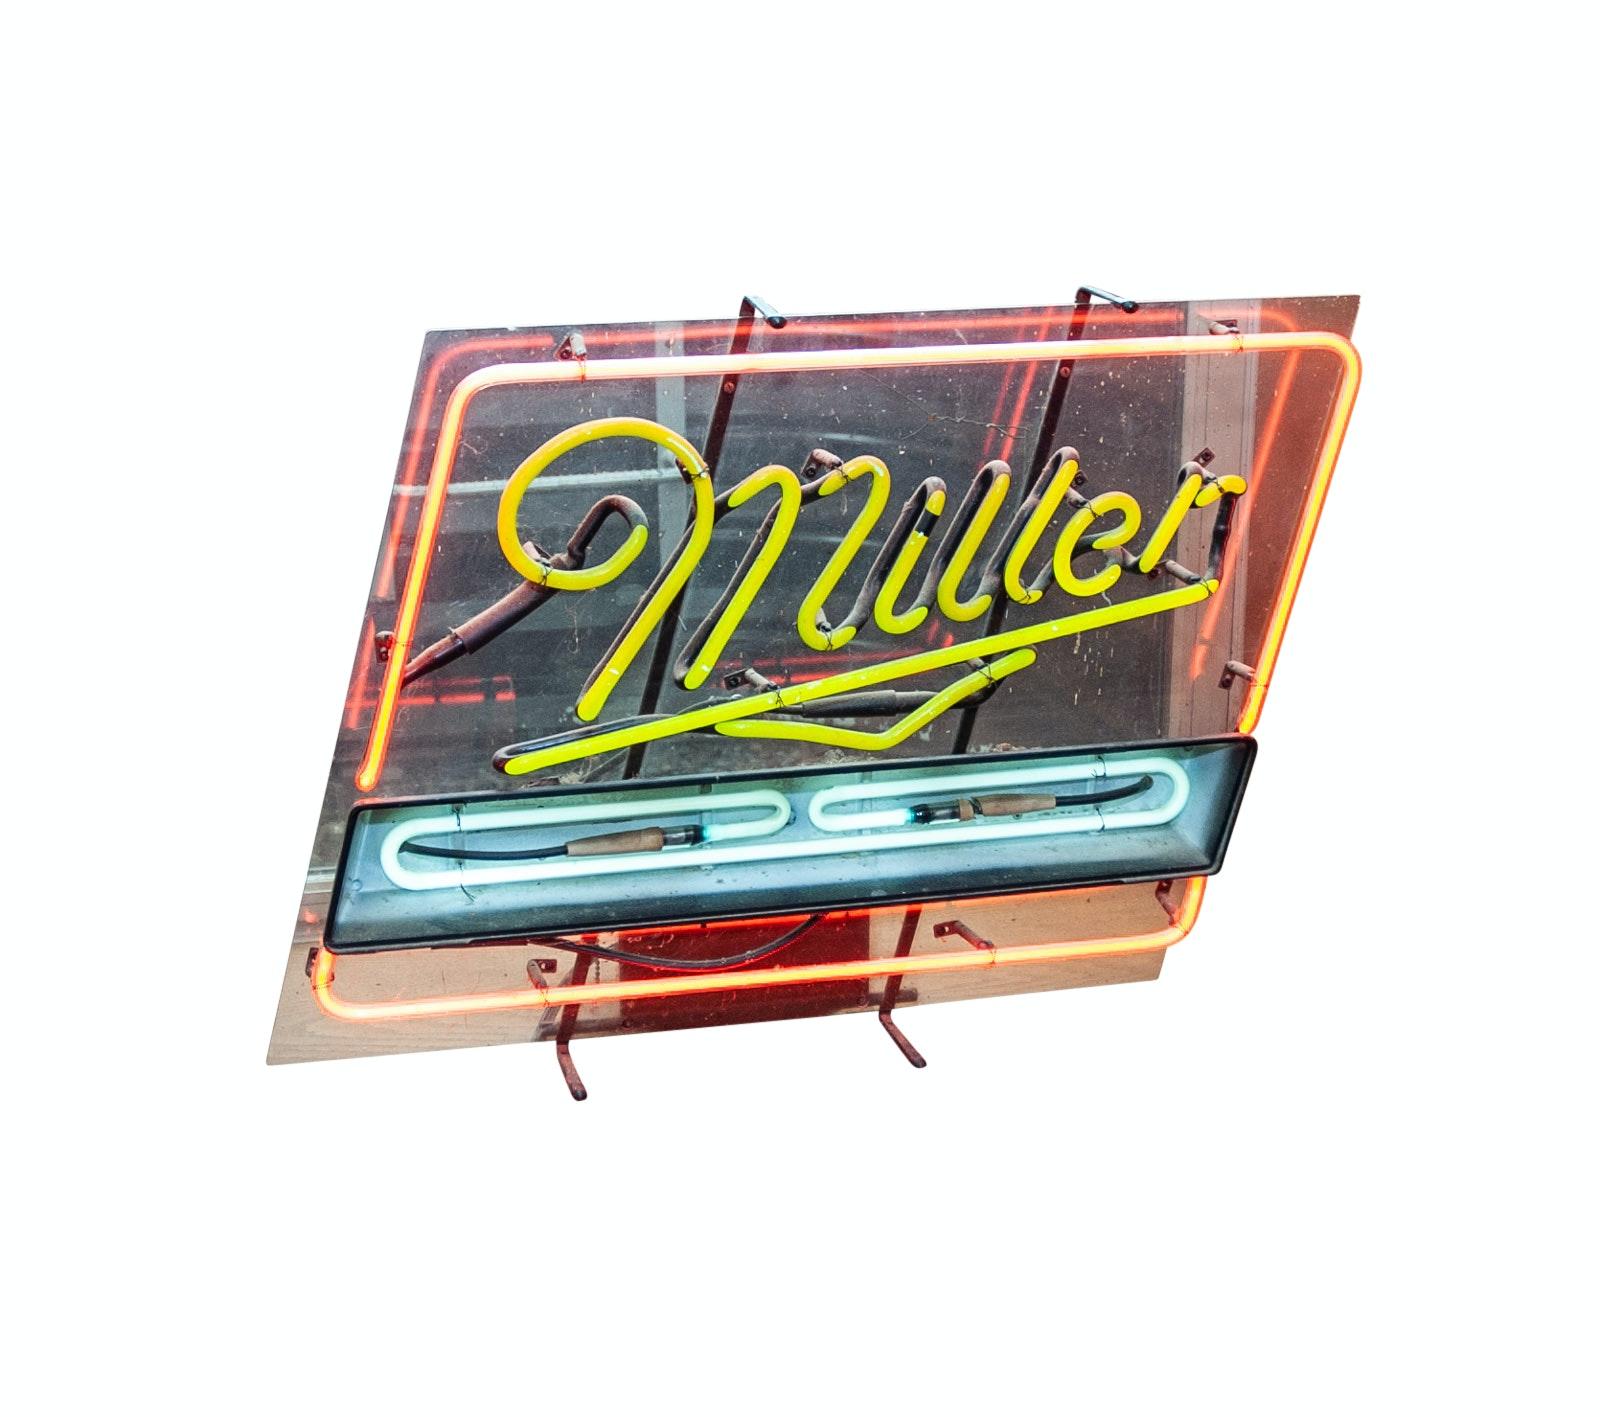 Vintage Miller Neon Beer Sign, 1960s